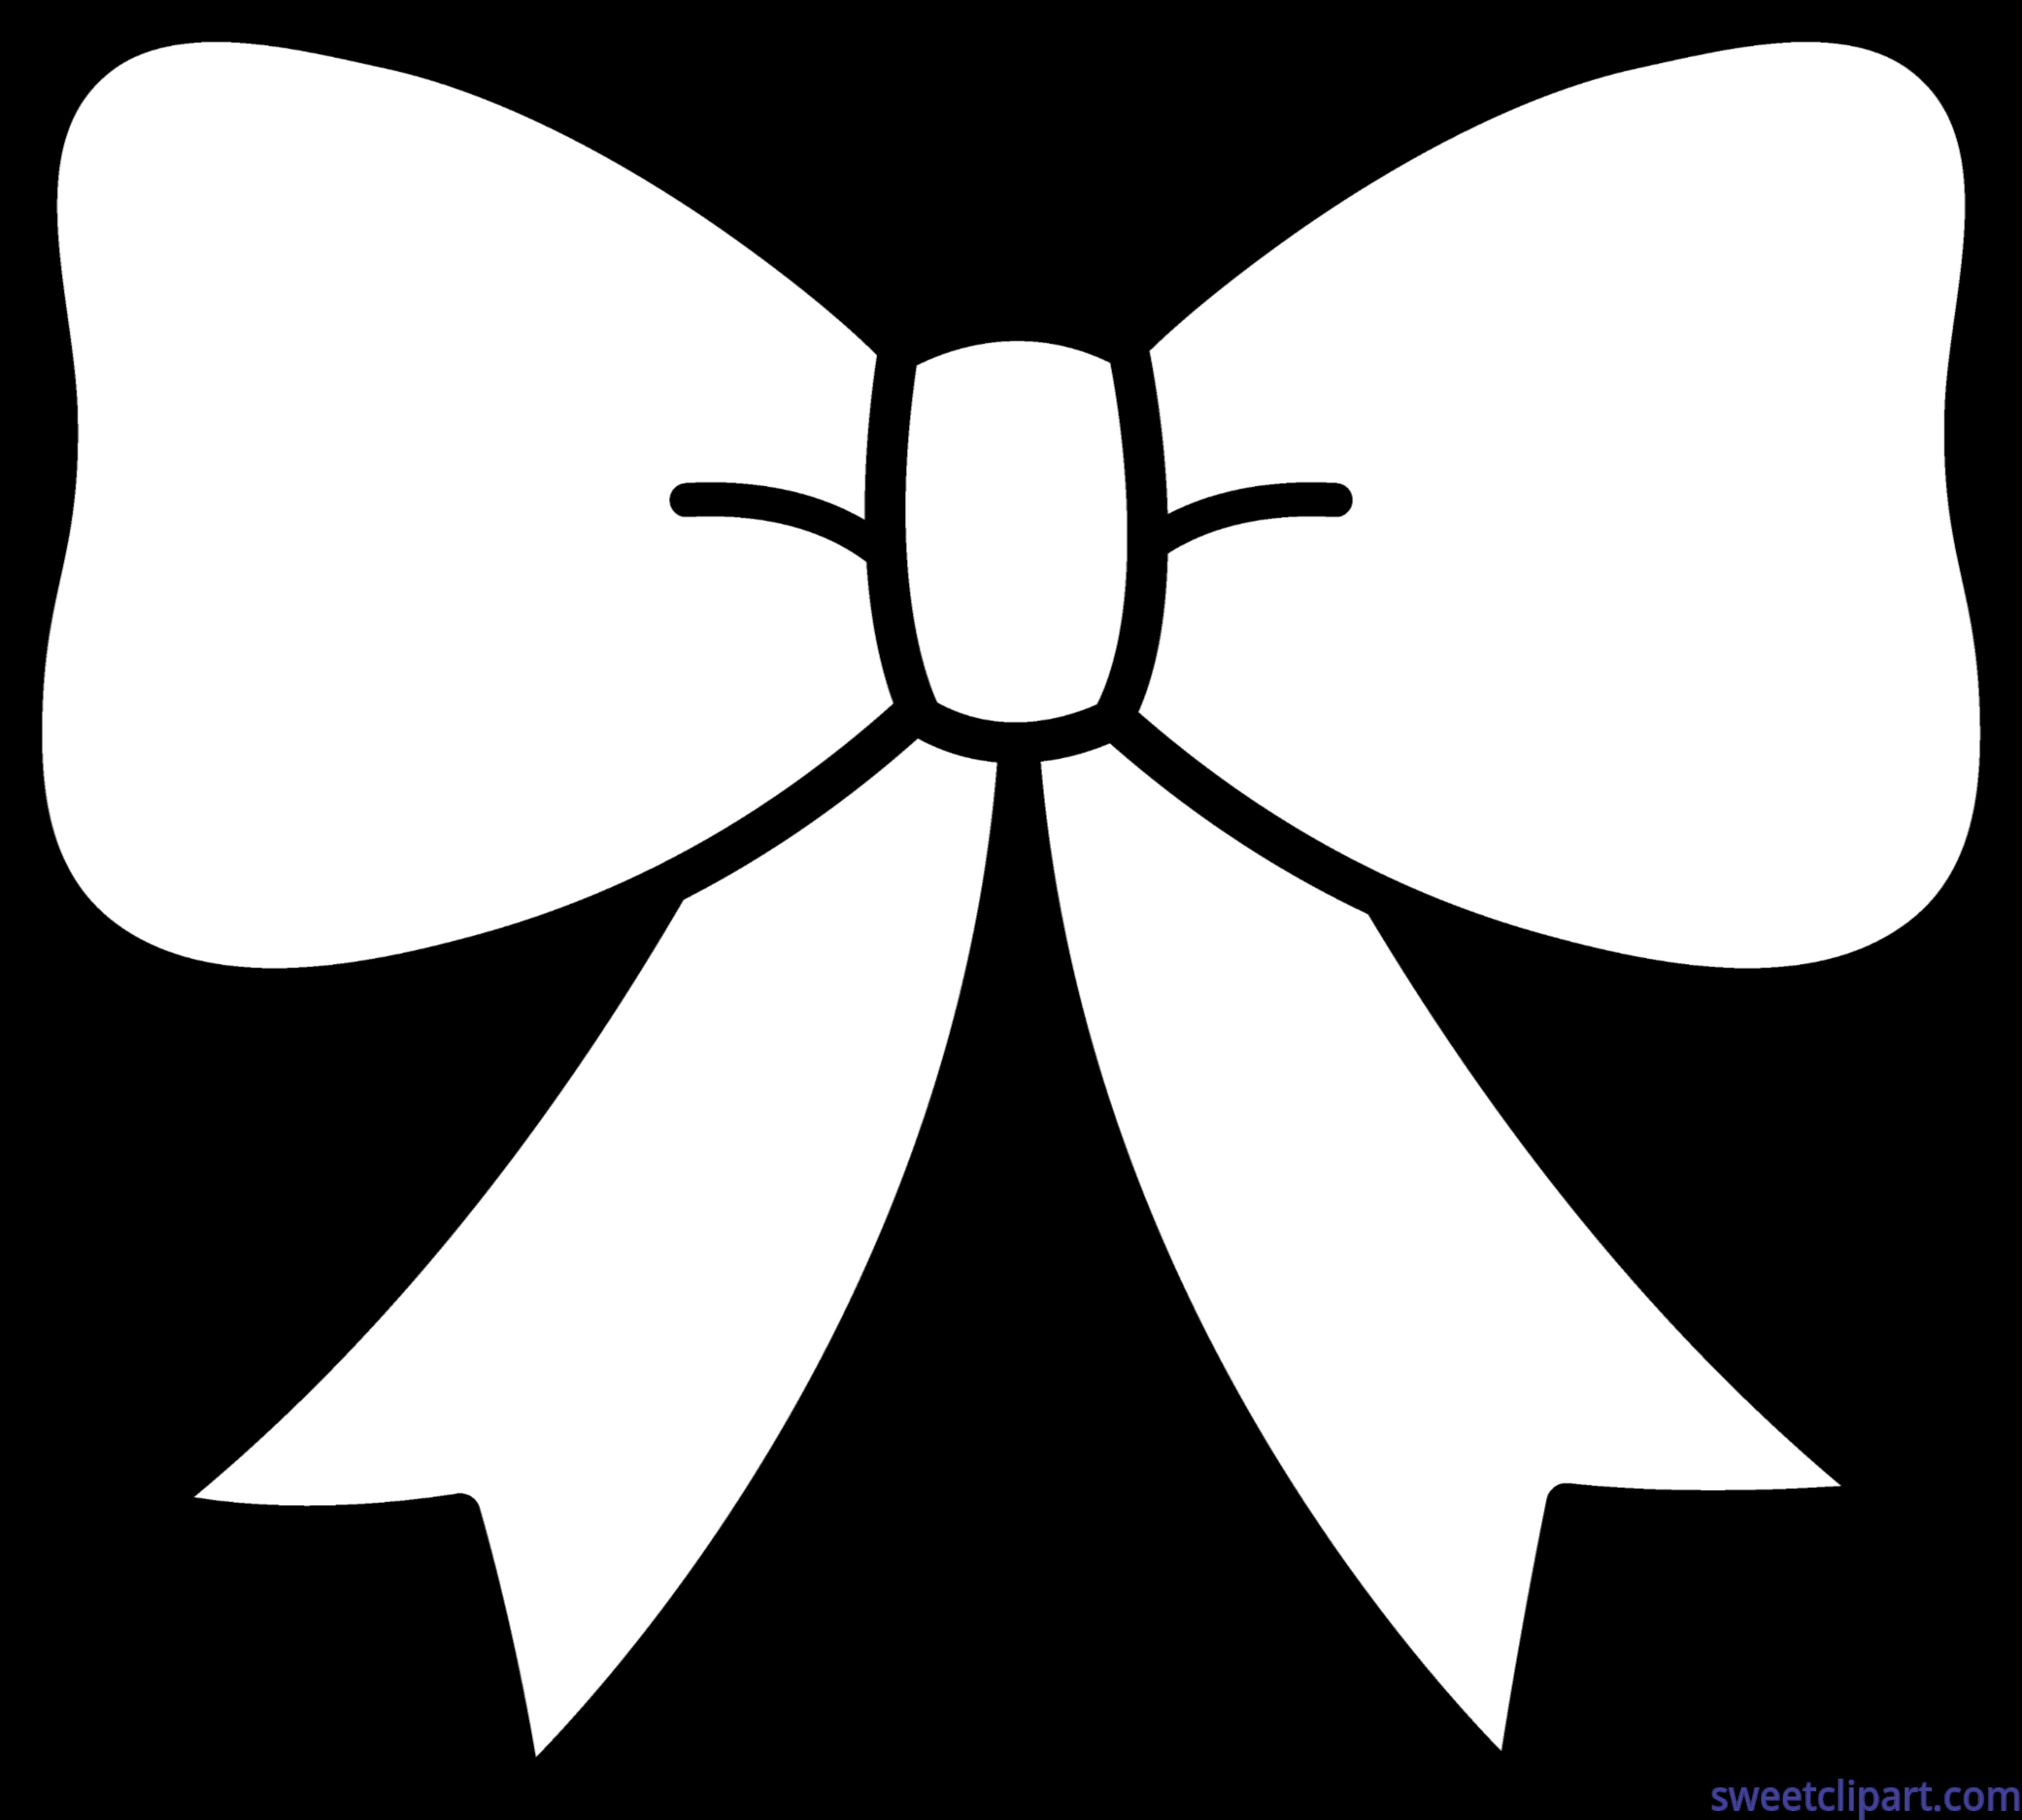 Cute Bow Black White Clip Art - Sweet Clip Art for Tie Clip Art Black And White  70ref